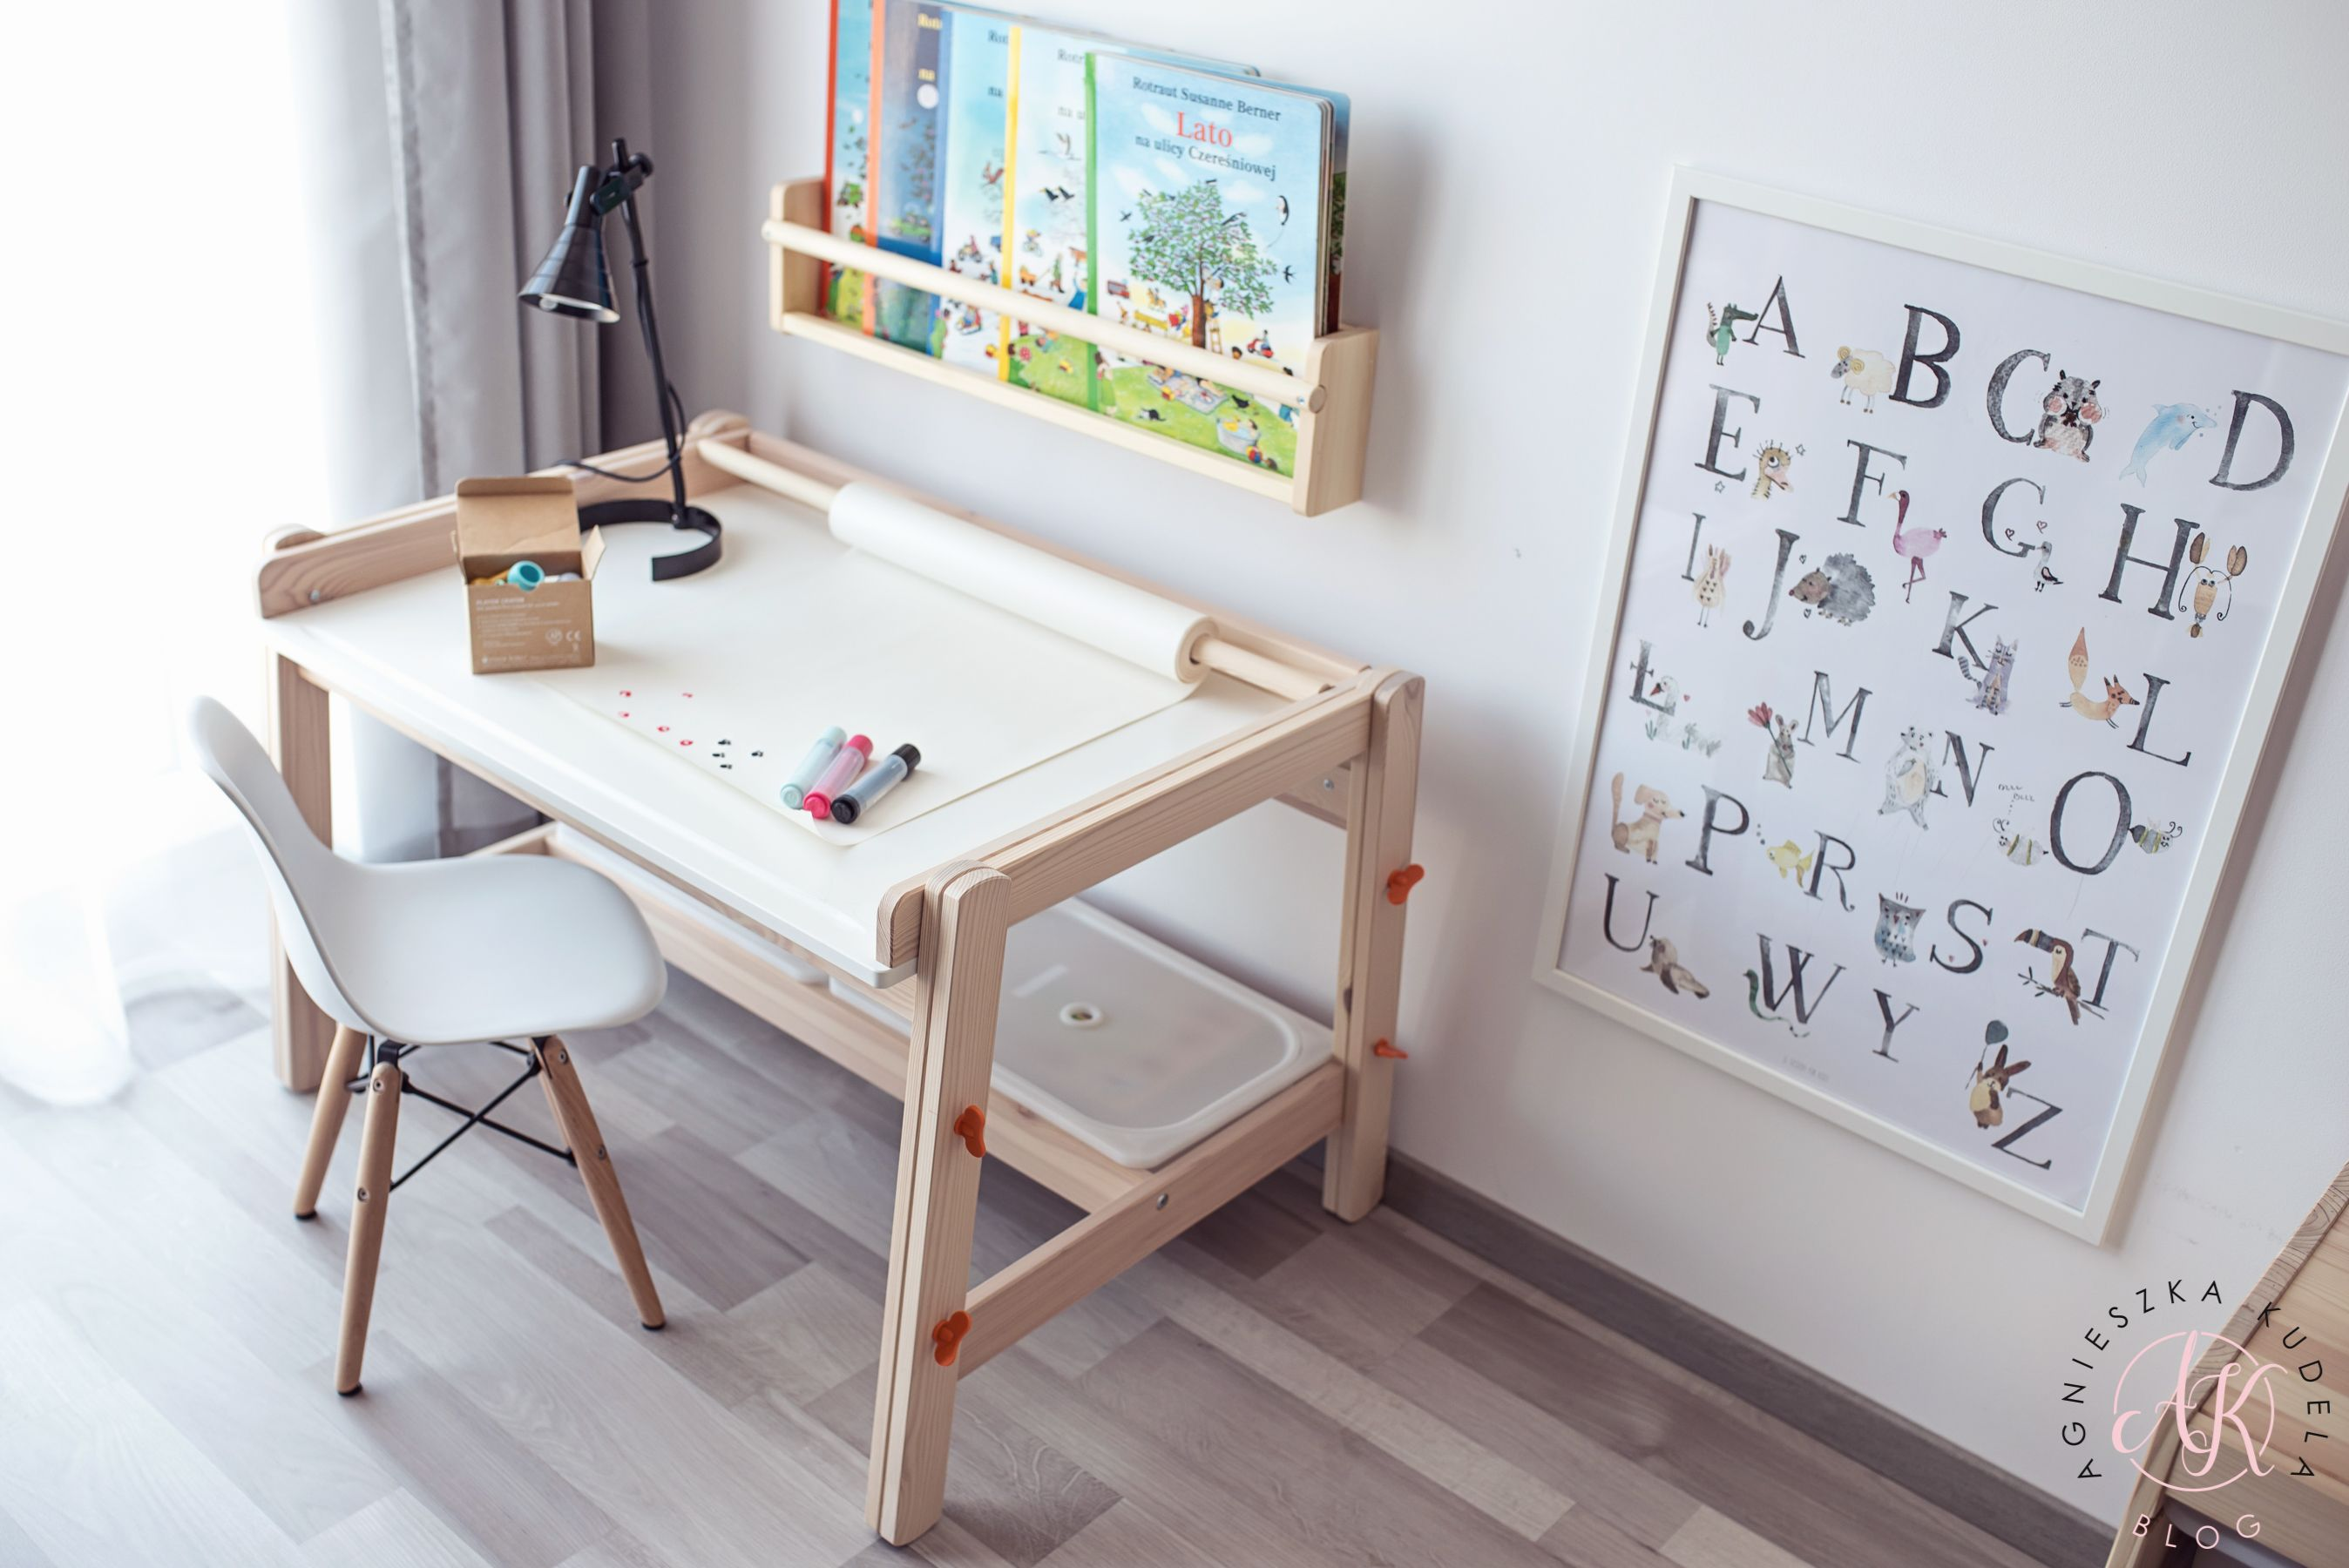 Pokoj Dzieciecy Przedszkolaka Children S Room Design For Preschooler Plakat Poster Alfabet Alphabet B Kids Study Desk Kids Room Design Childrens Desk